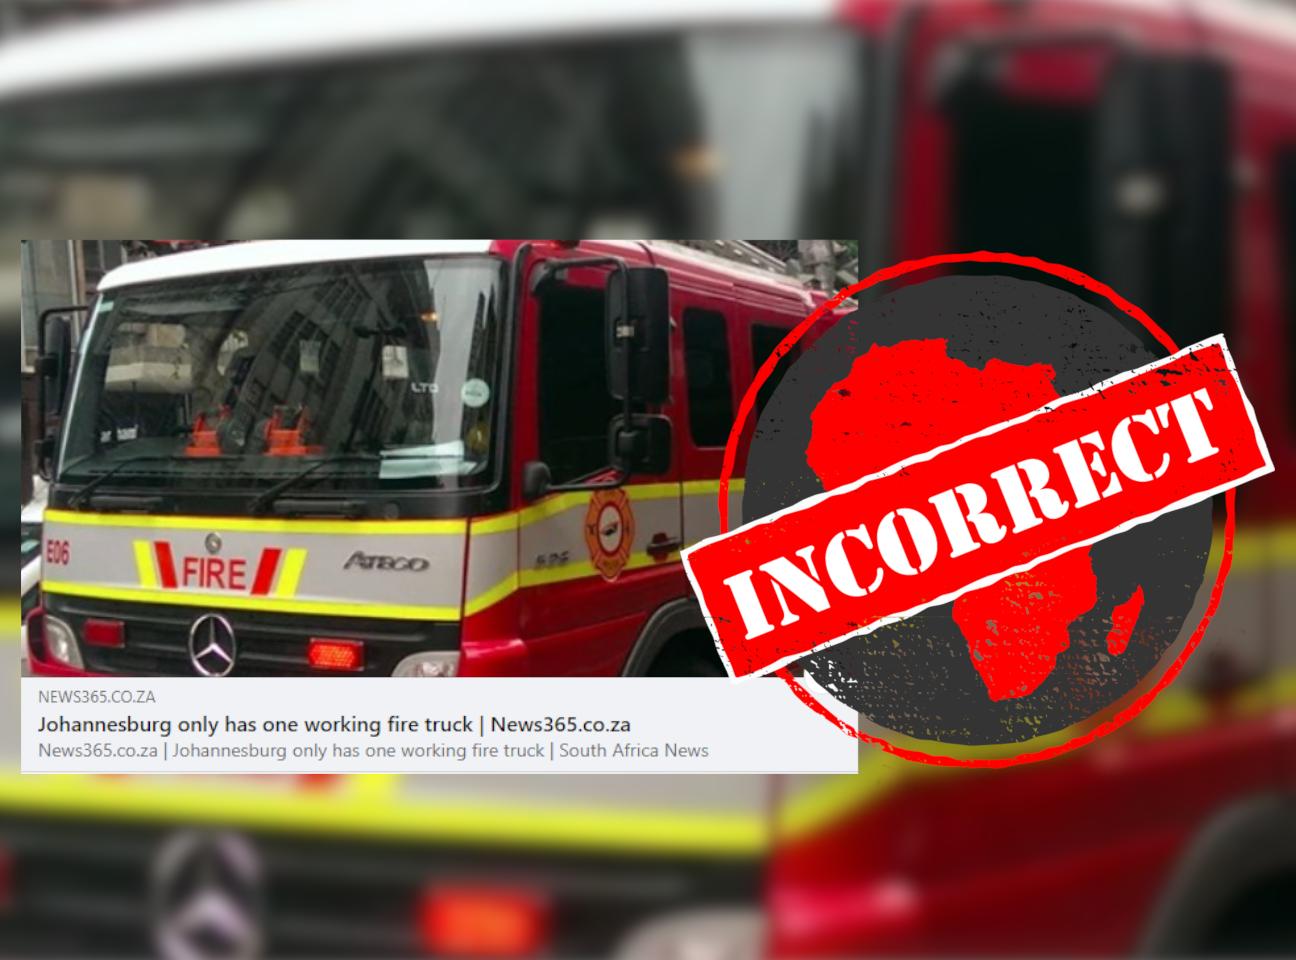 Firetruck_Incorrect